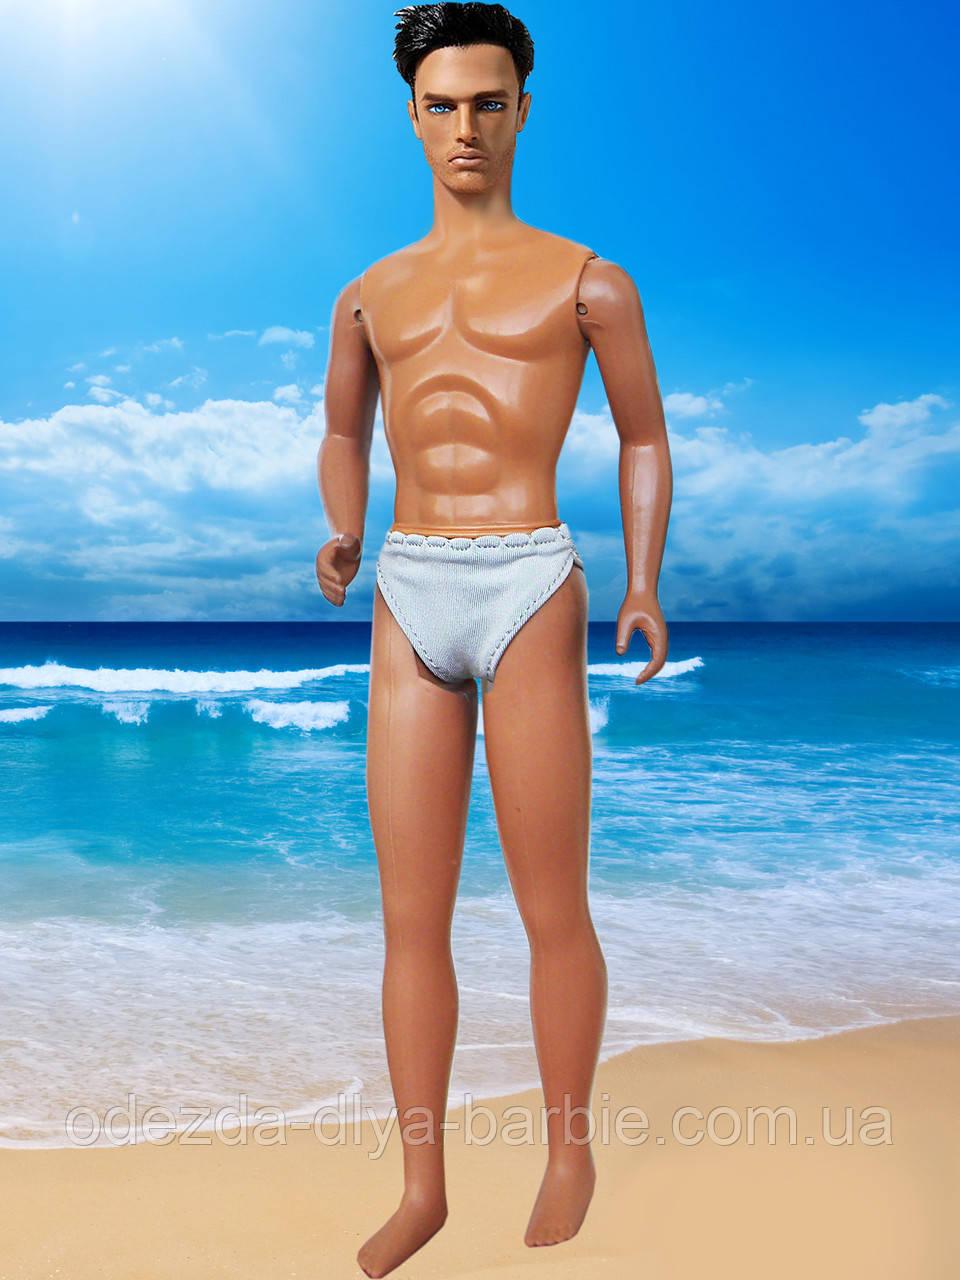 Одежда для Кена - плавки